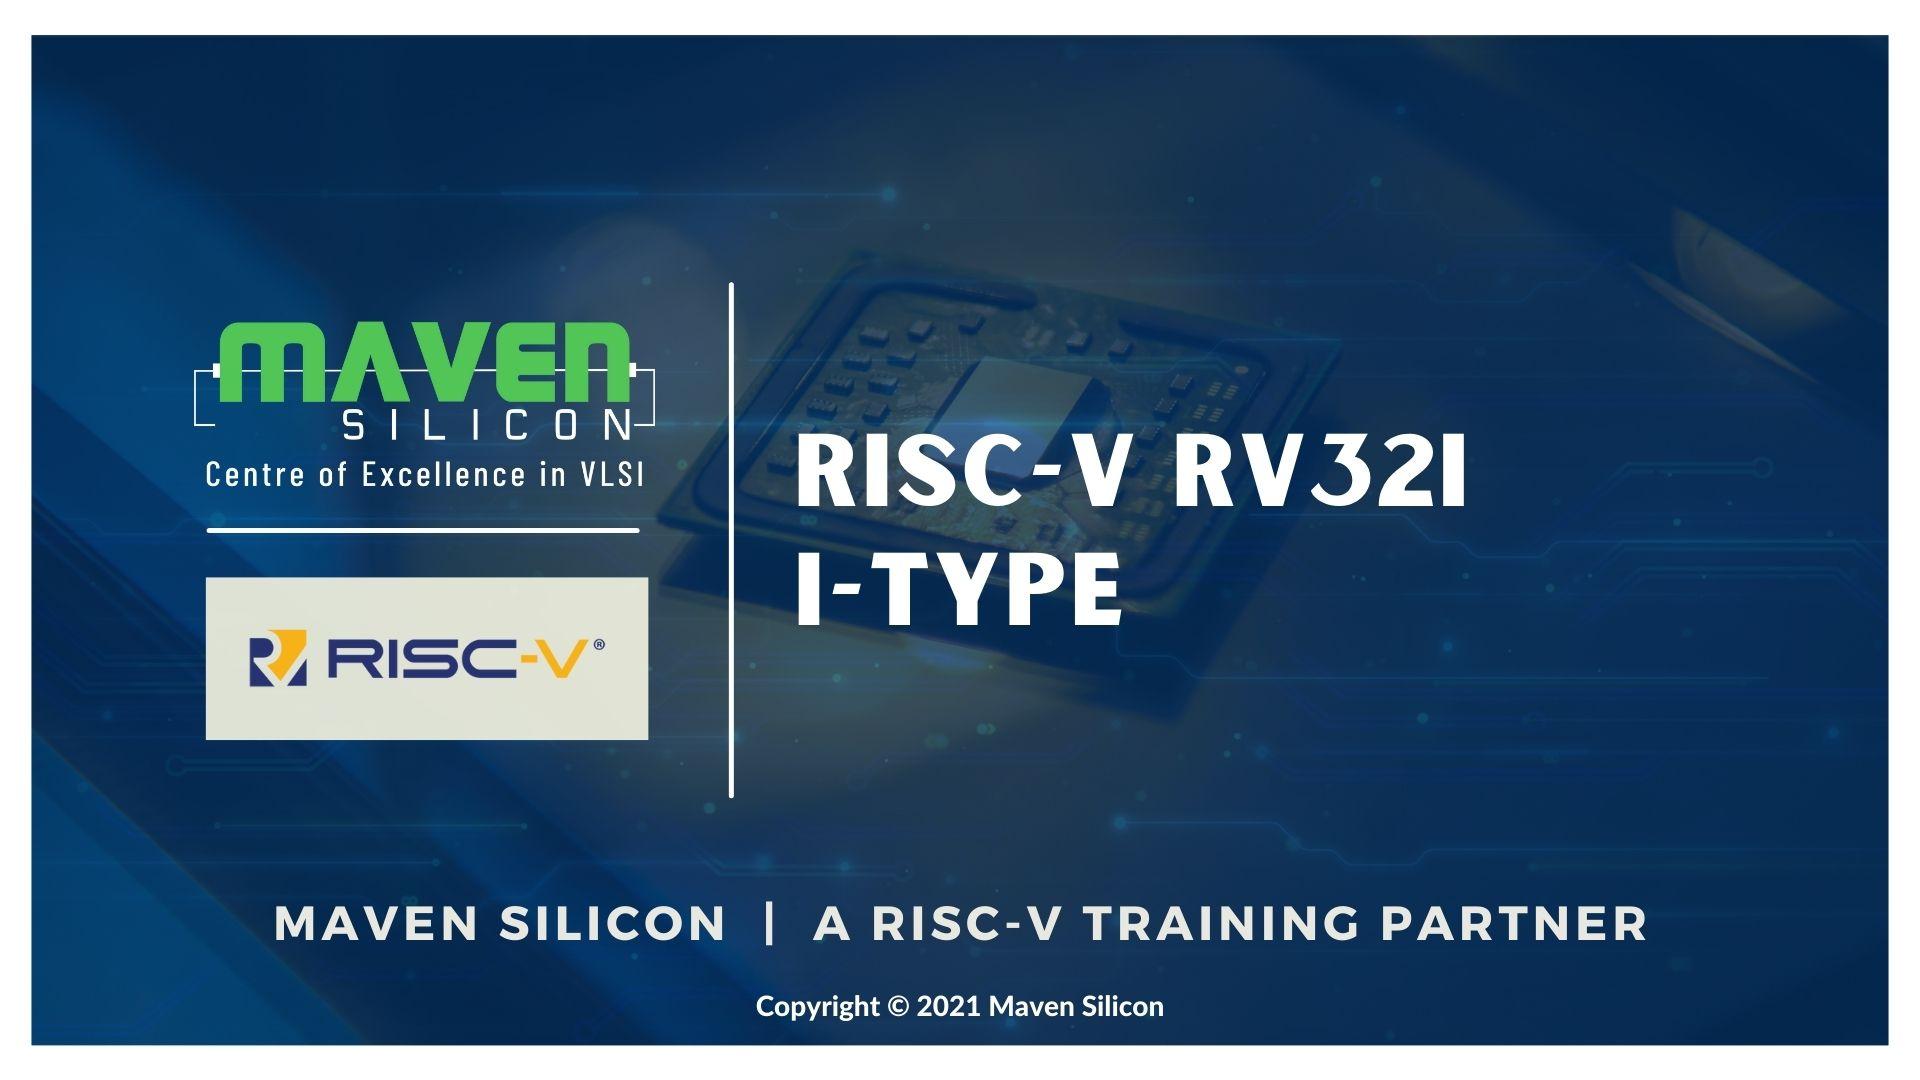 RISC-V RV32I R-Type | Maven Silicon